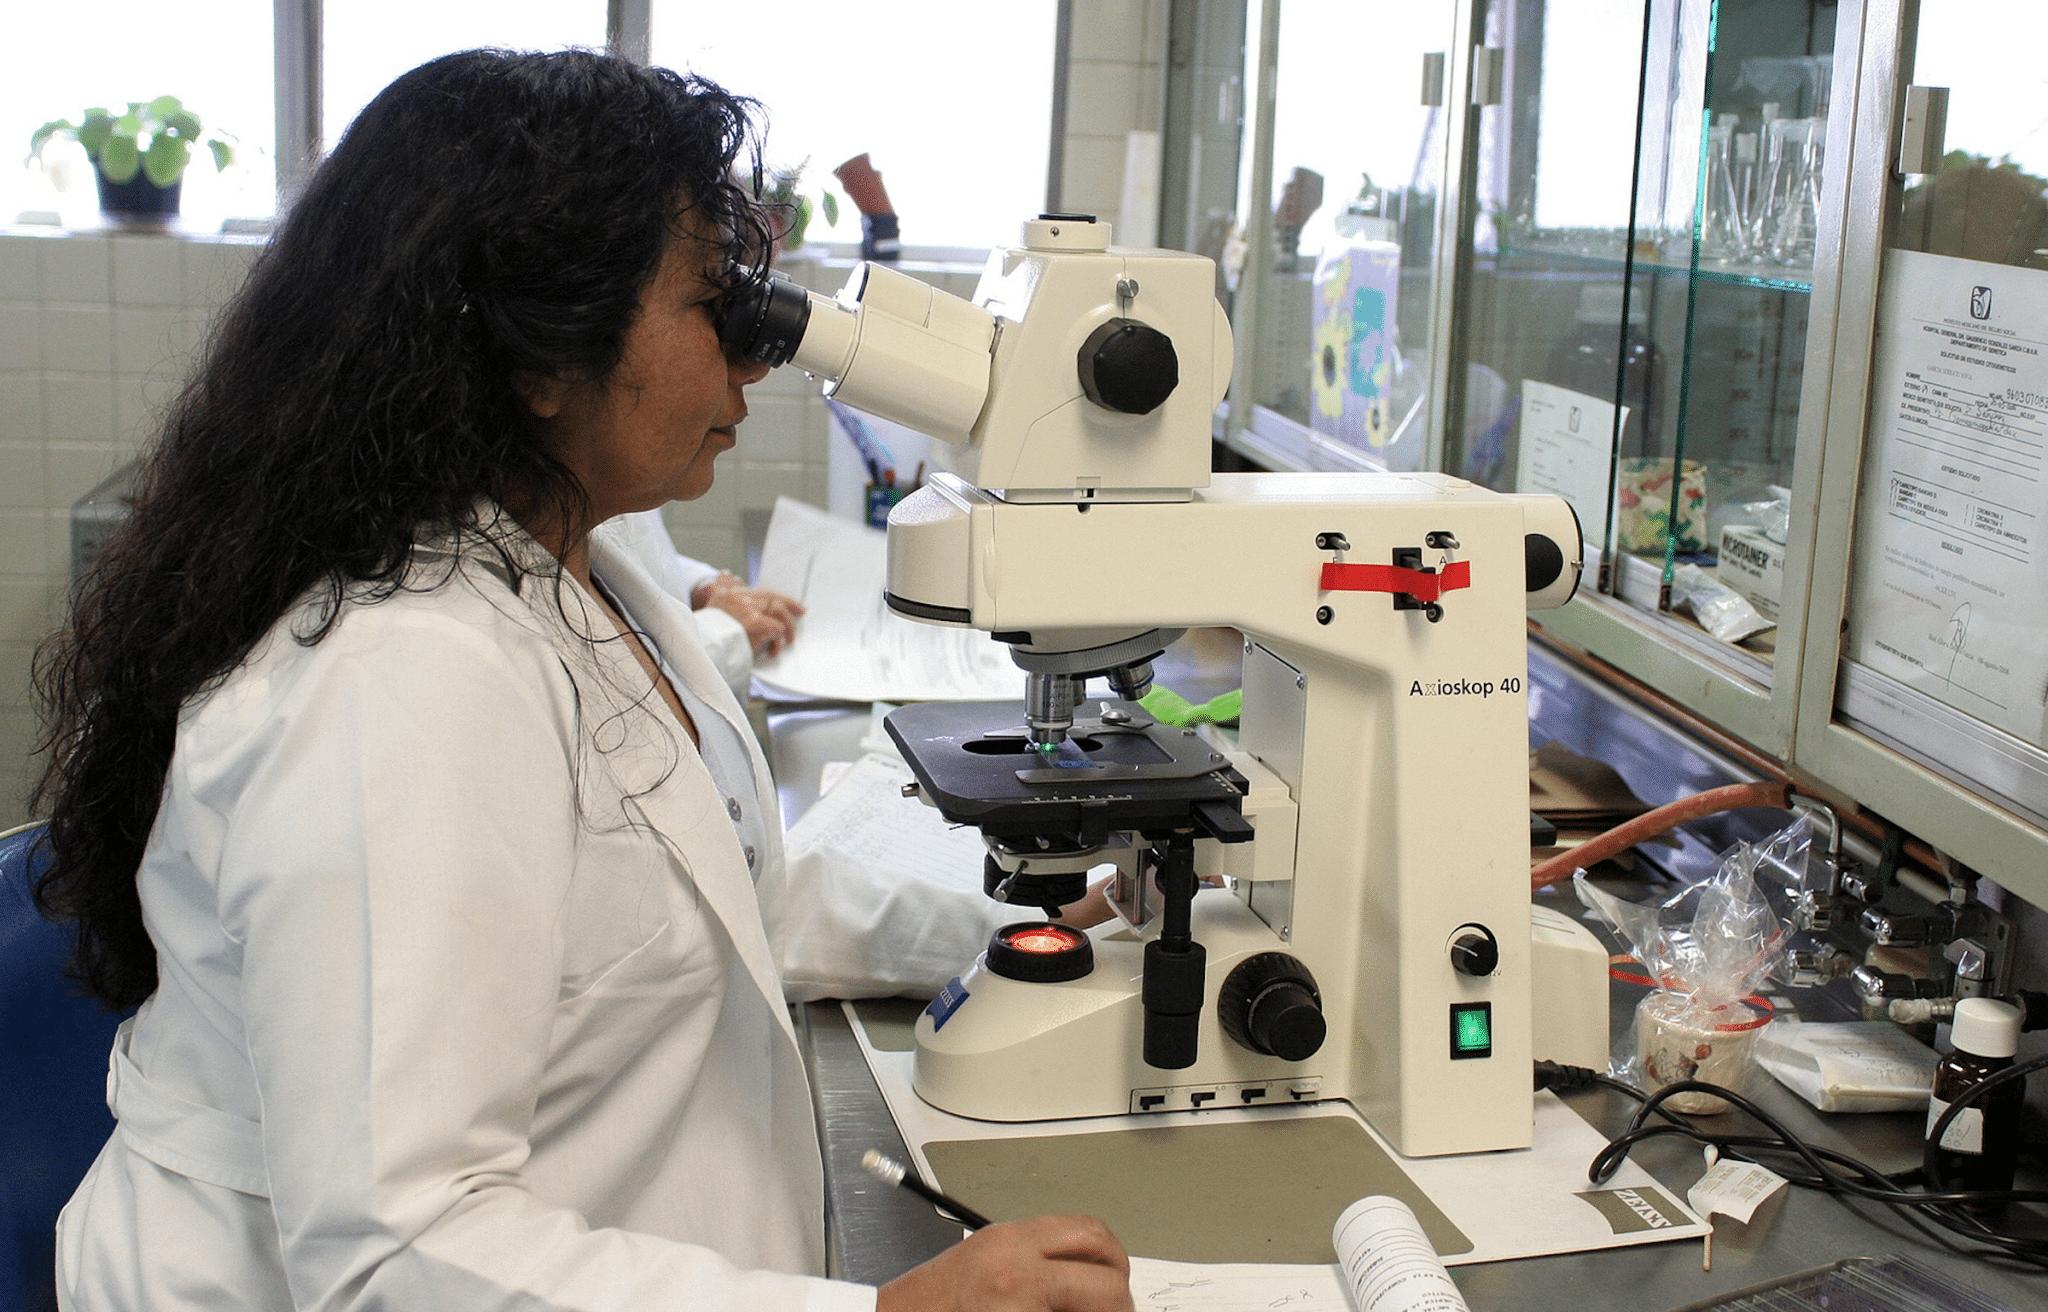 Female lab professional